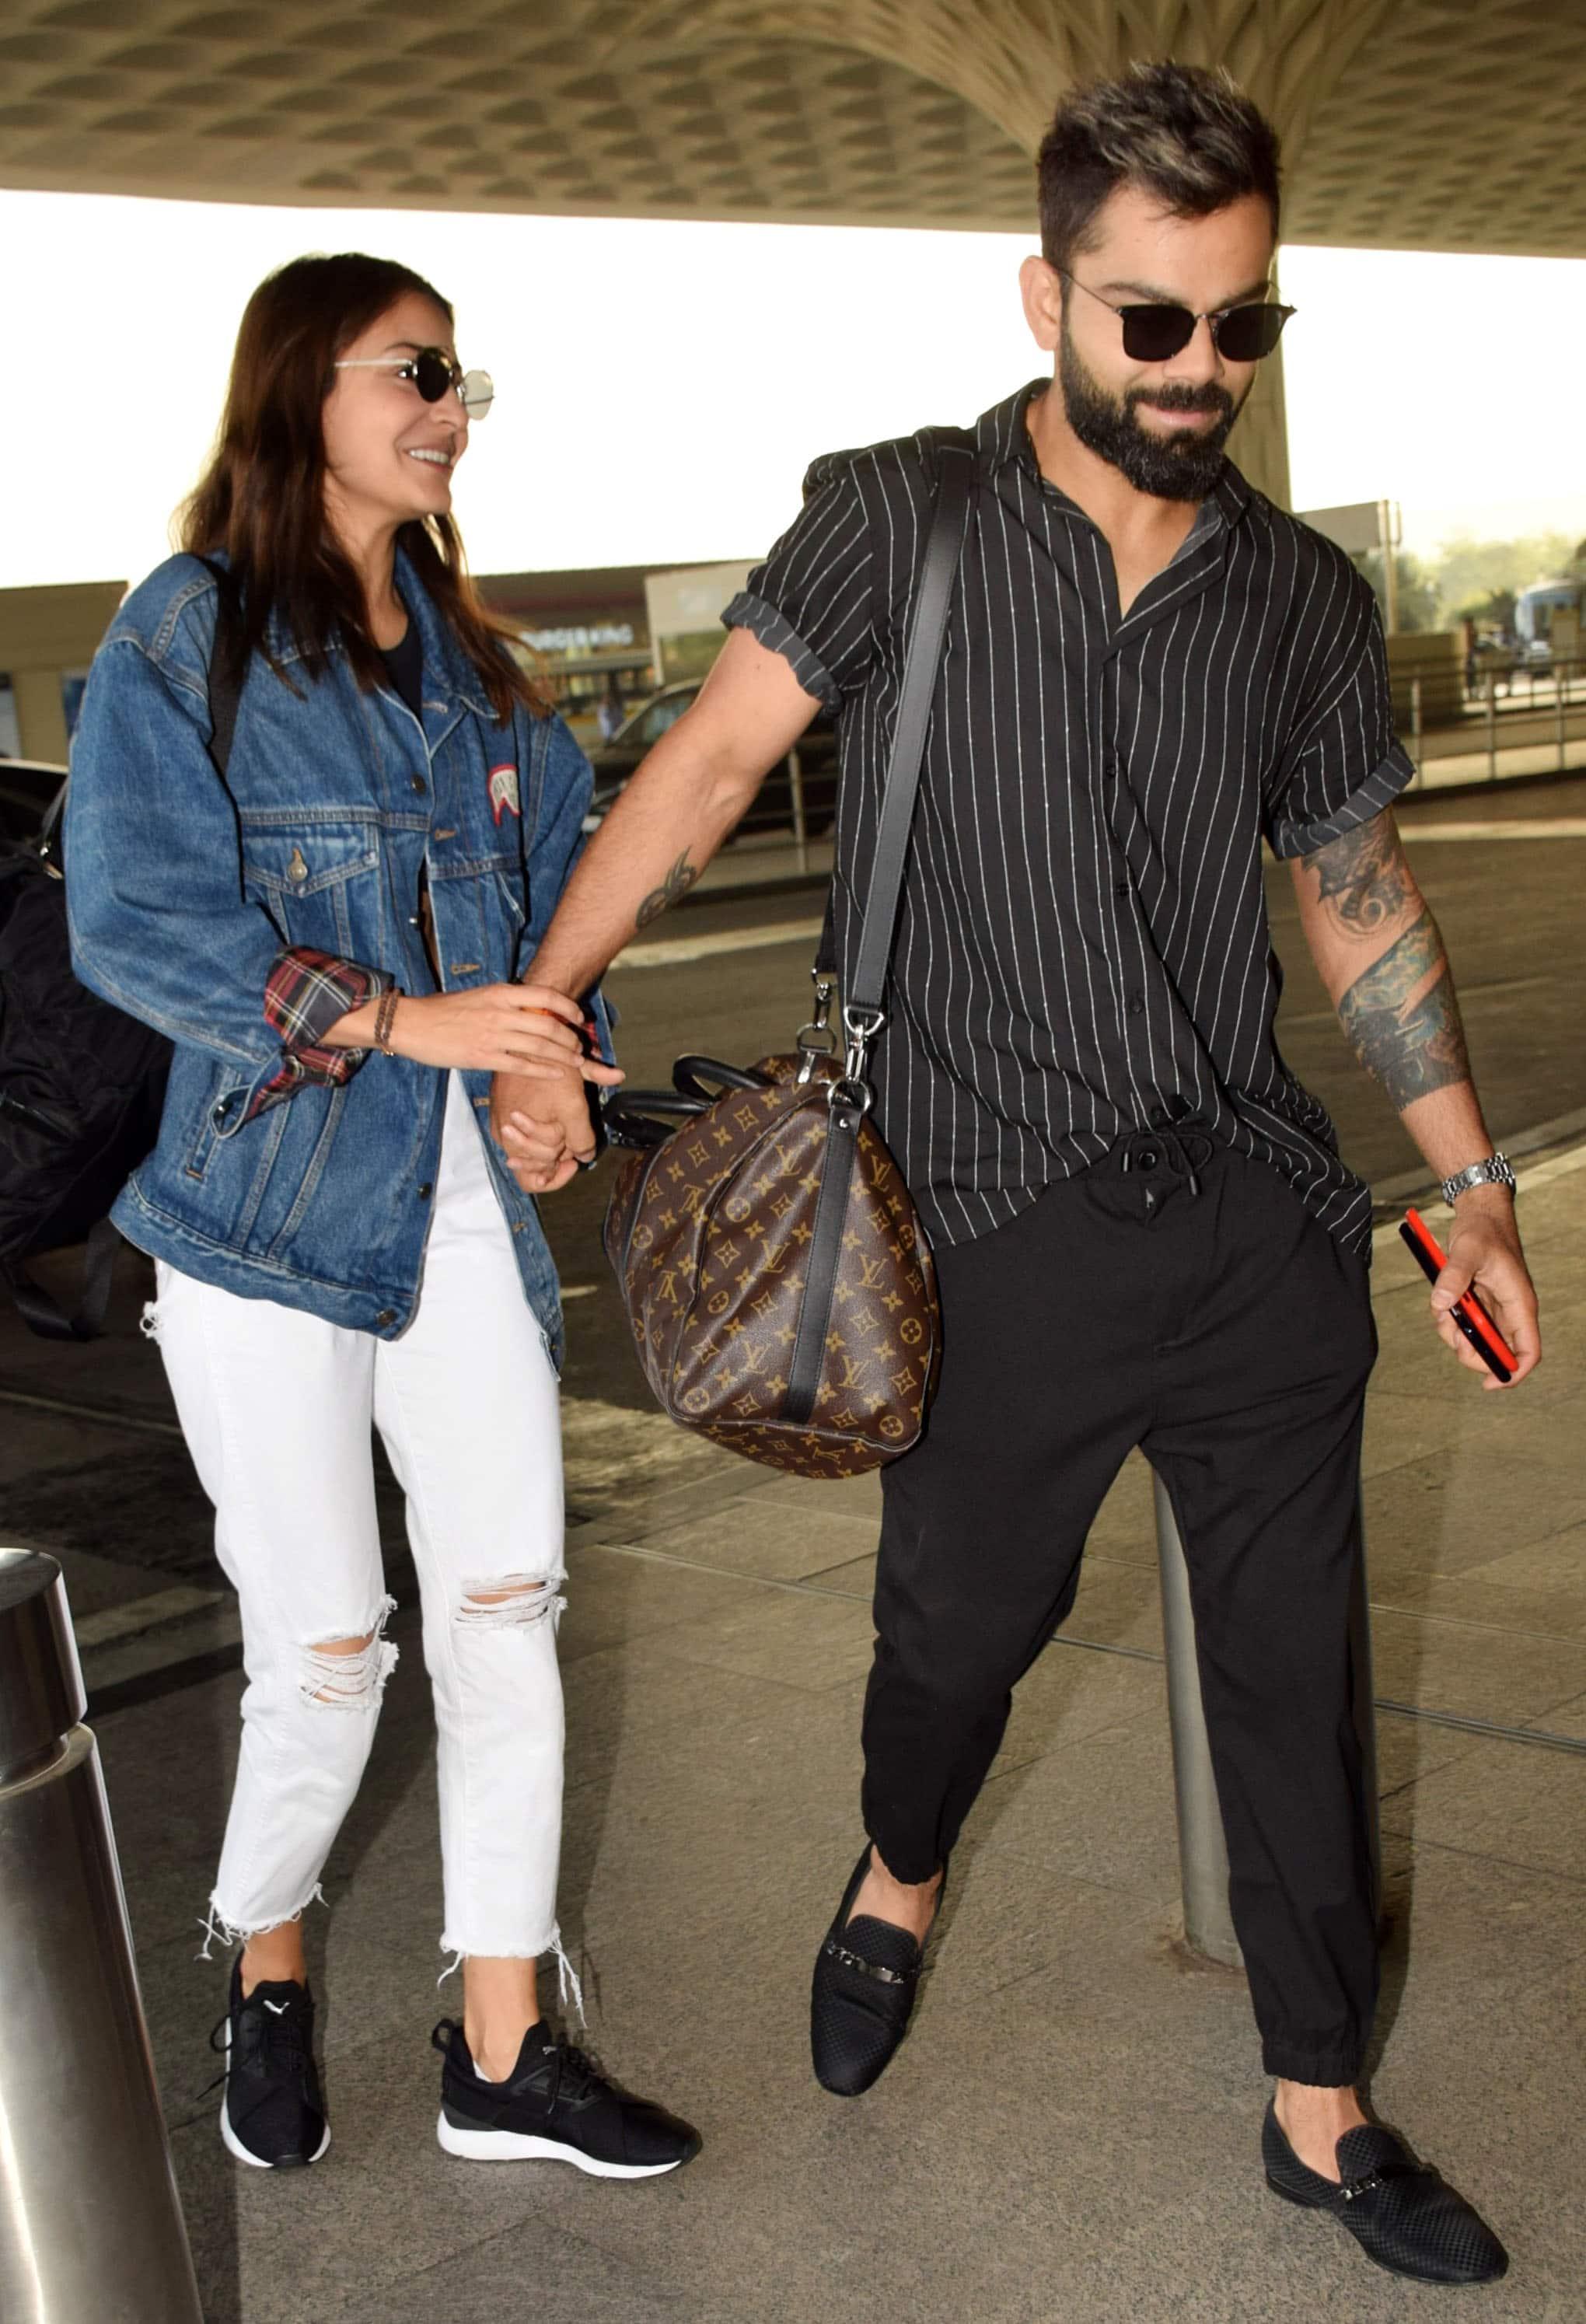 Virat Kohli And Anushka Sharma Slay Airport Fashion In Pics